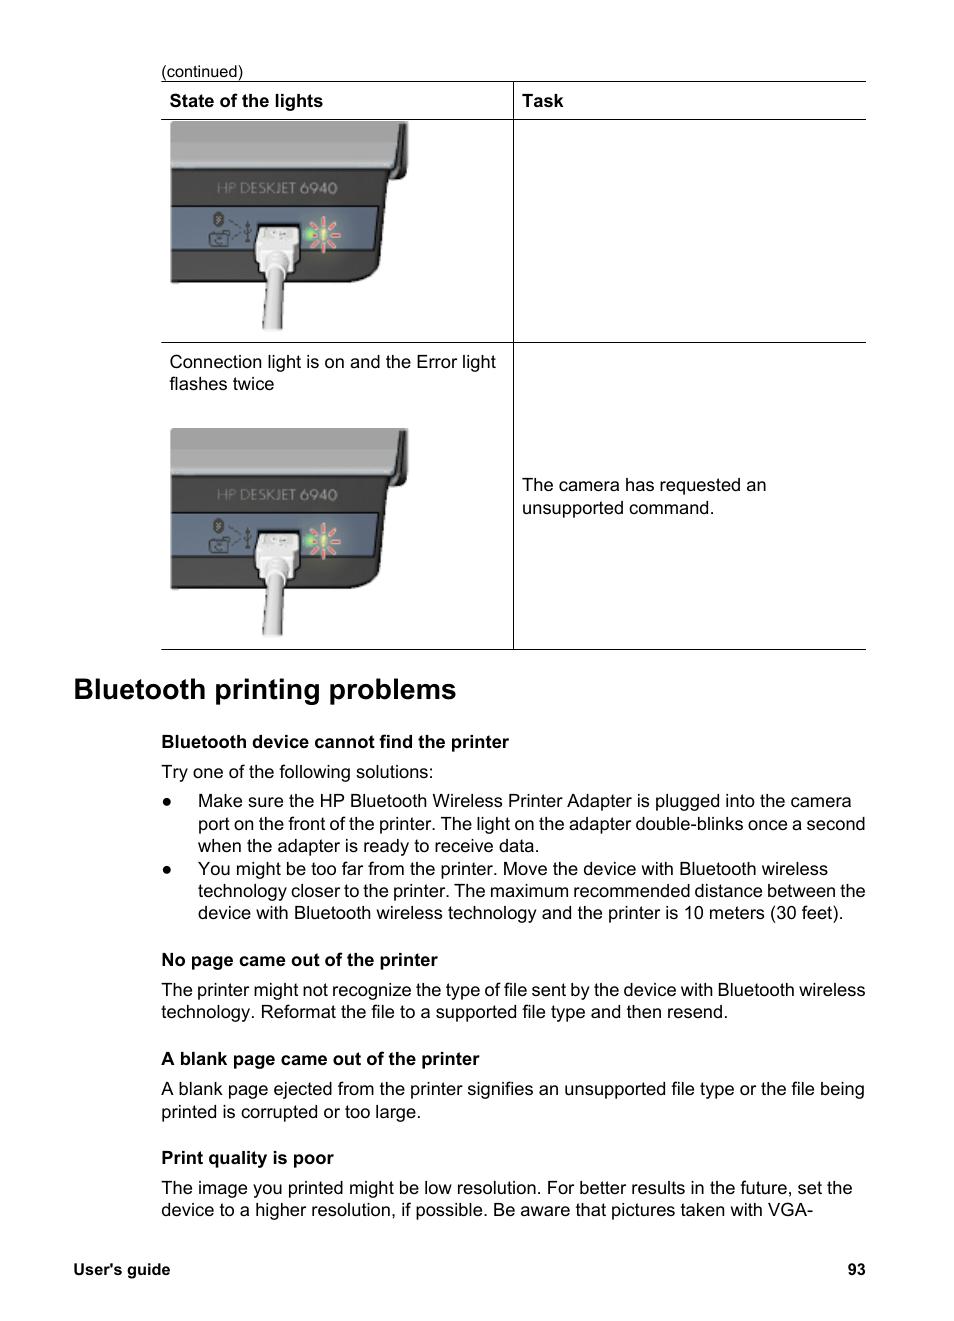 Bluetooth printing problems | HP Deskjet 6943 Printer User Manual